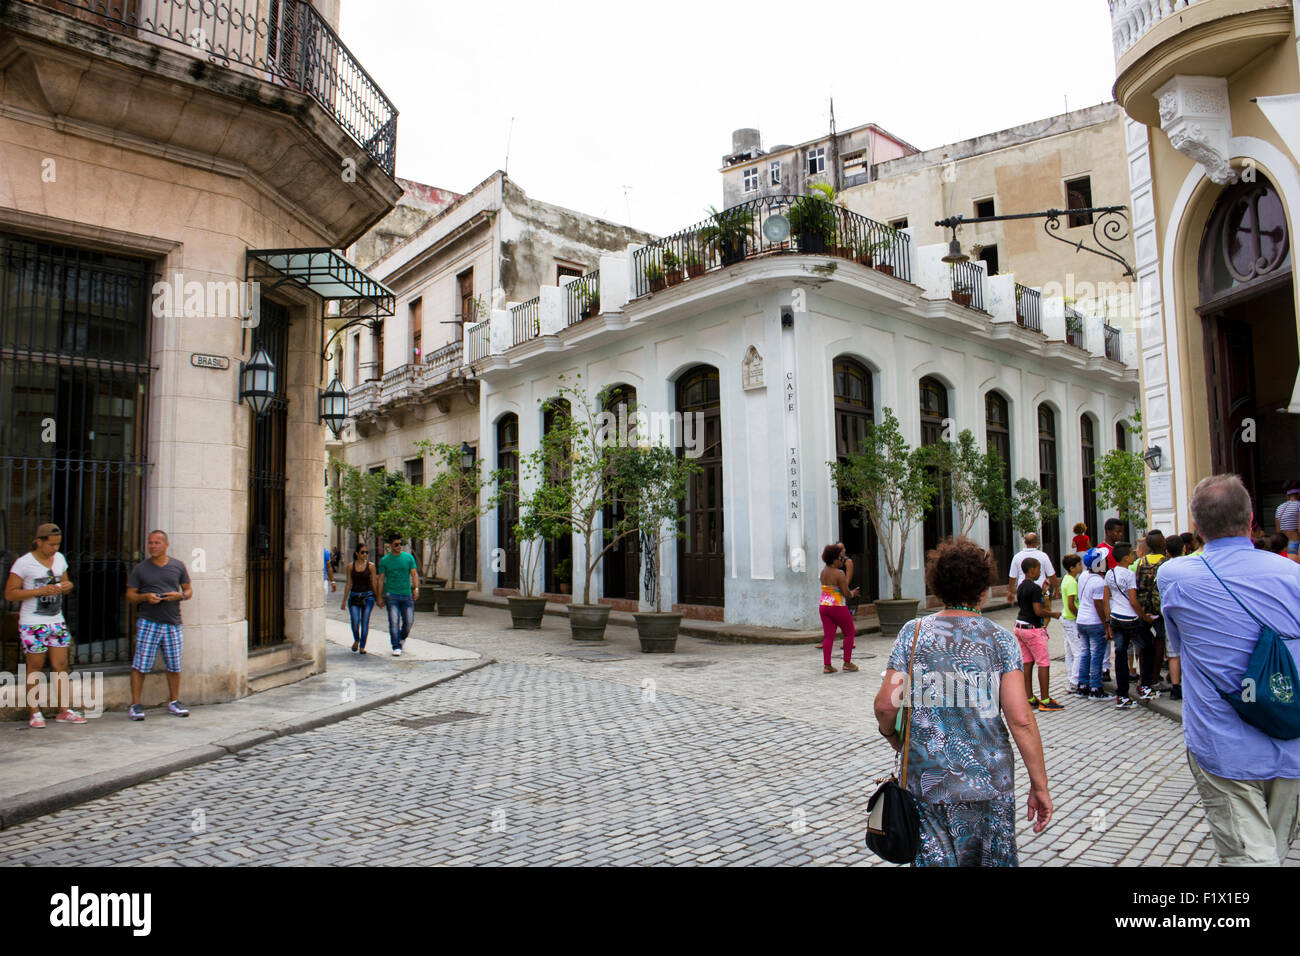 Plaza Vieja and Cafe Taberna  in Havana - Cuba - Stock Image